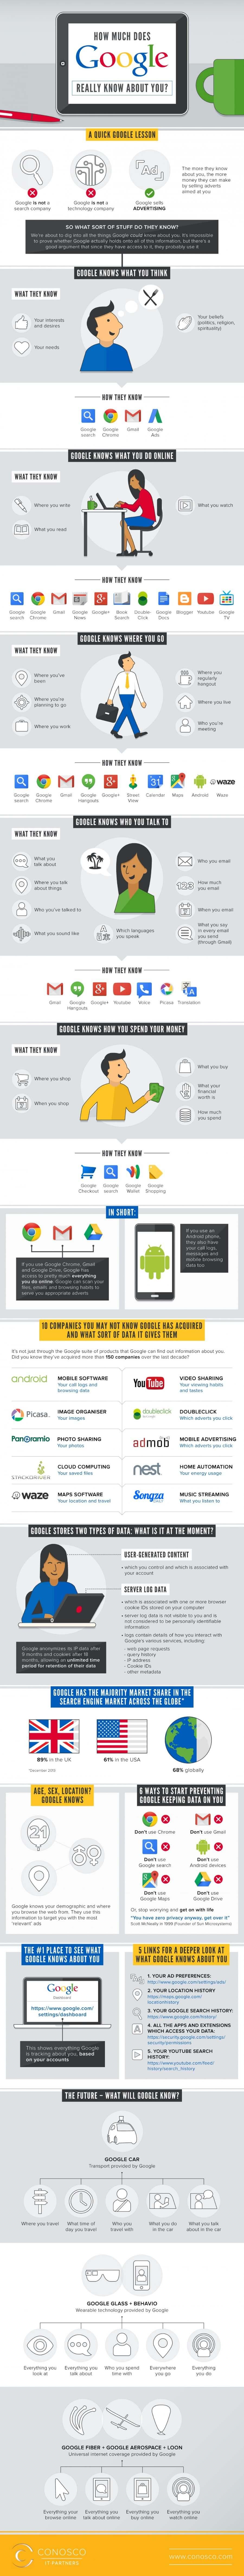 Google Know (2) (1)